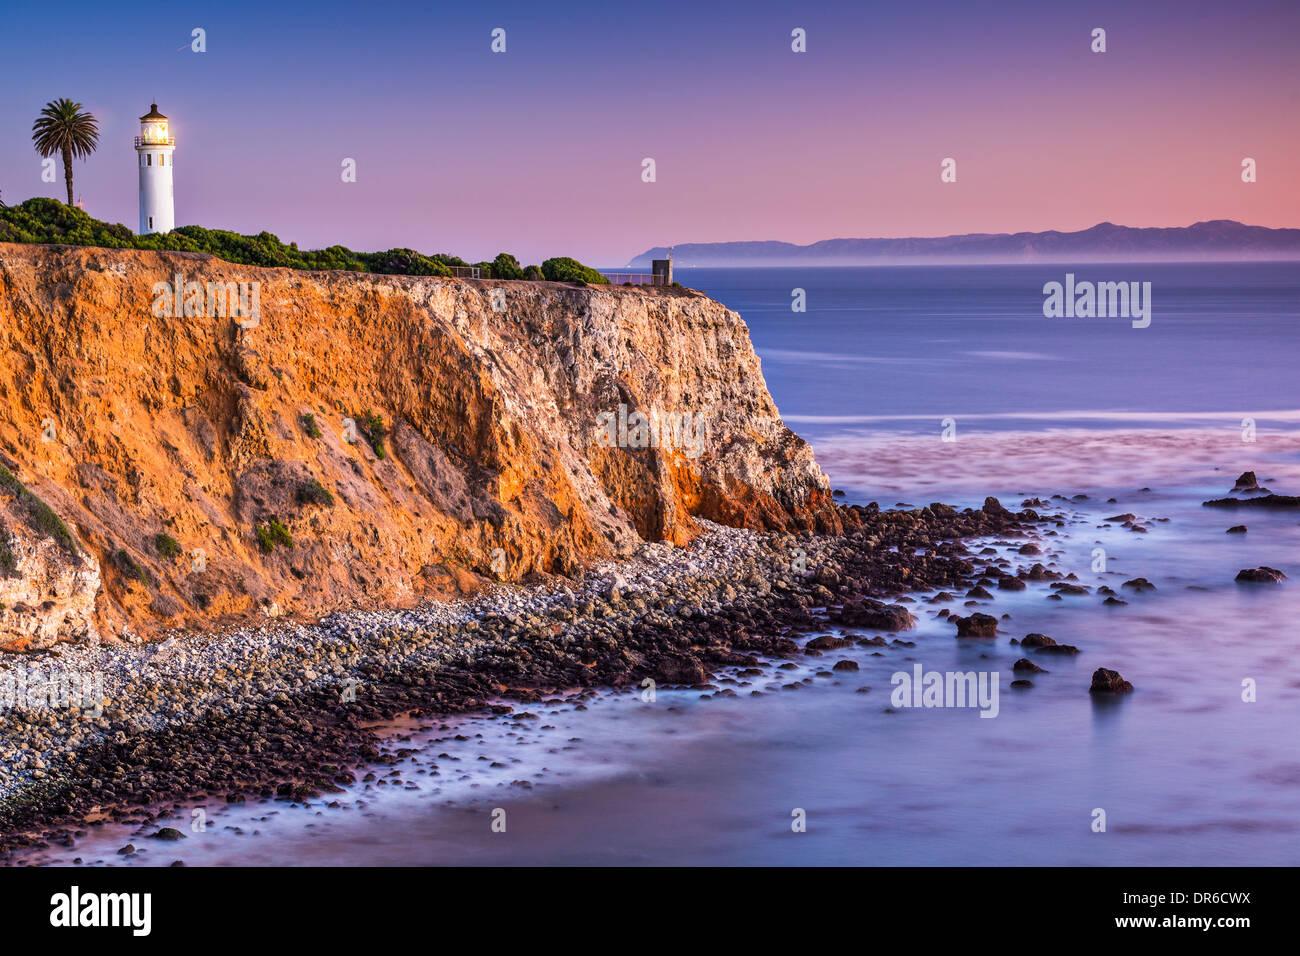 Point Vicente in Rancho Palos Verdes, Los Angeles, California. - Stock Image